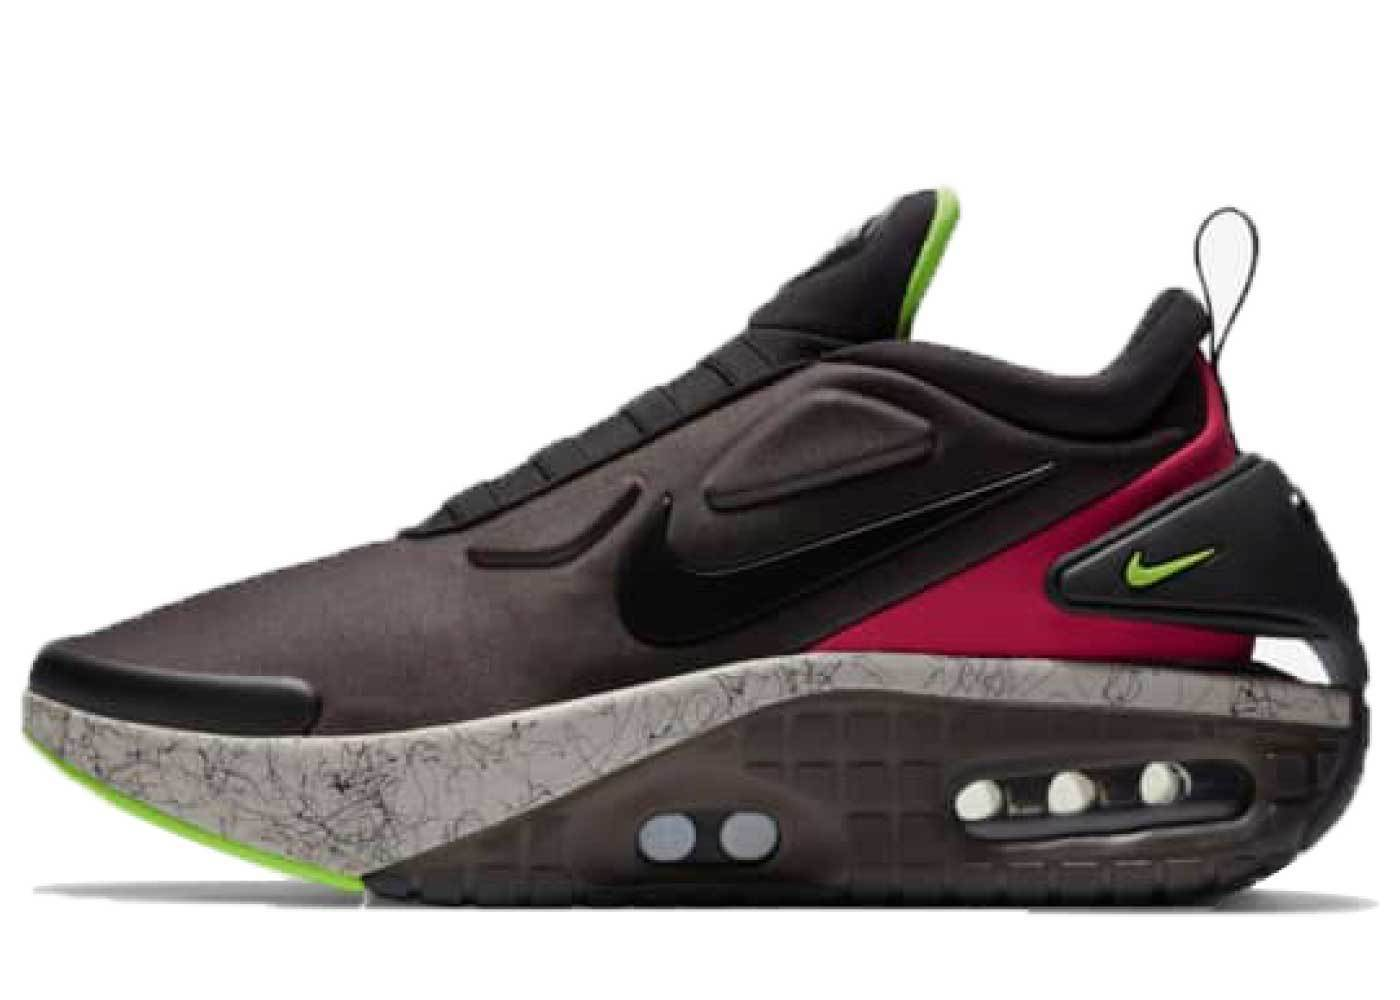 Nike Adapt Auto Max Fireberryの写真